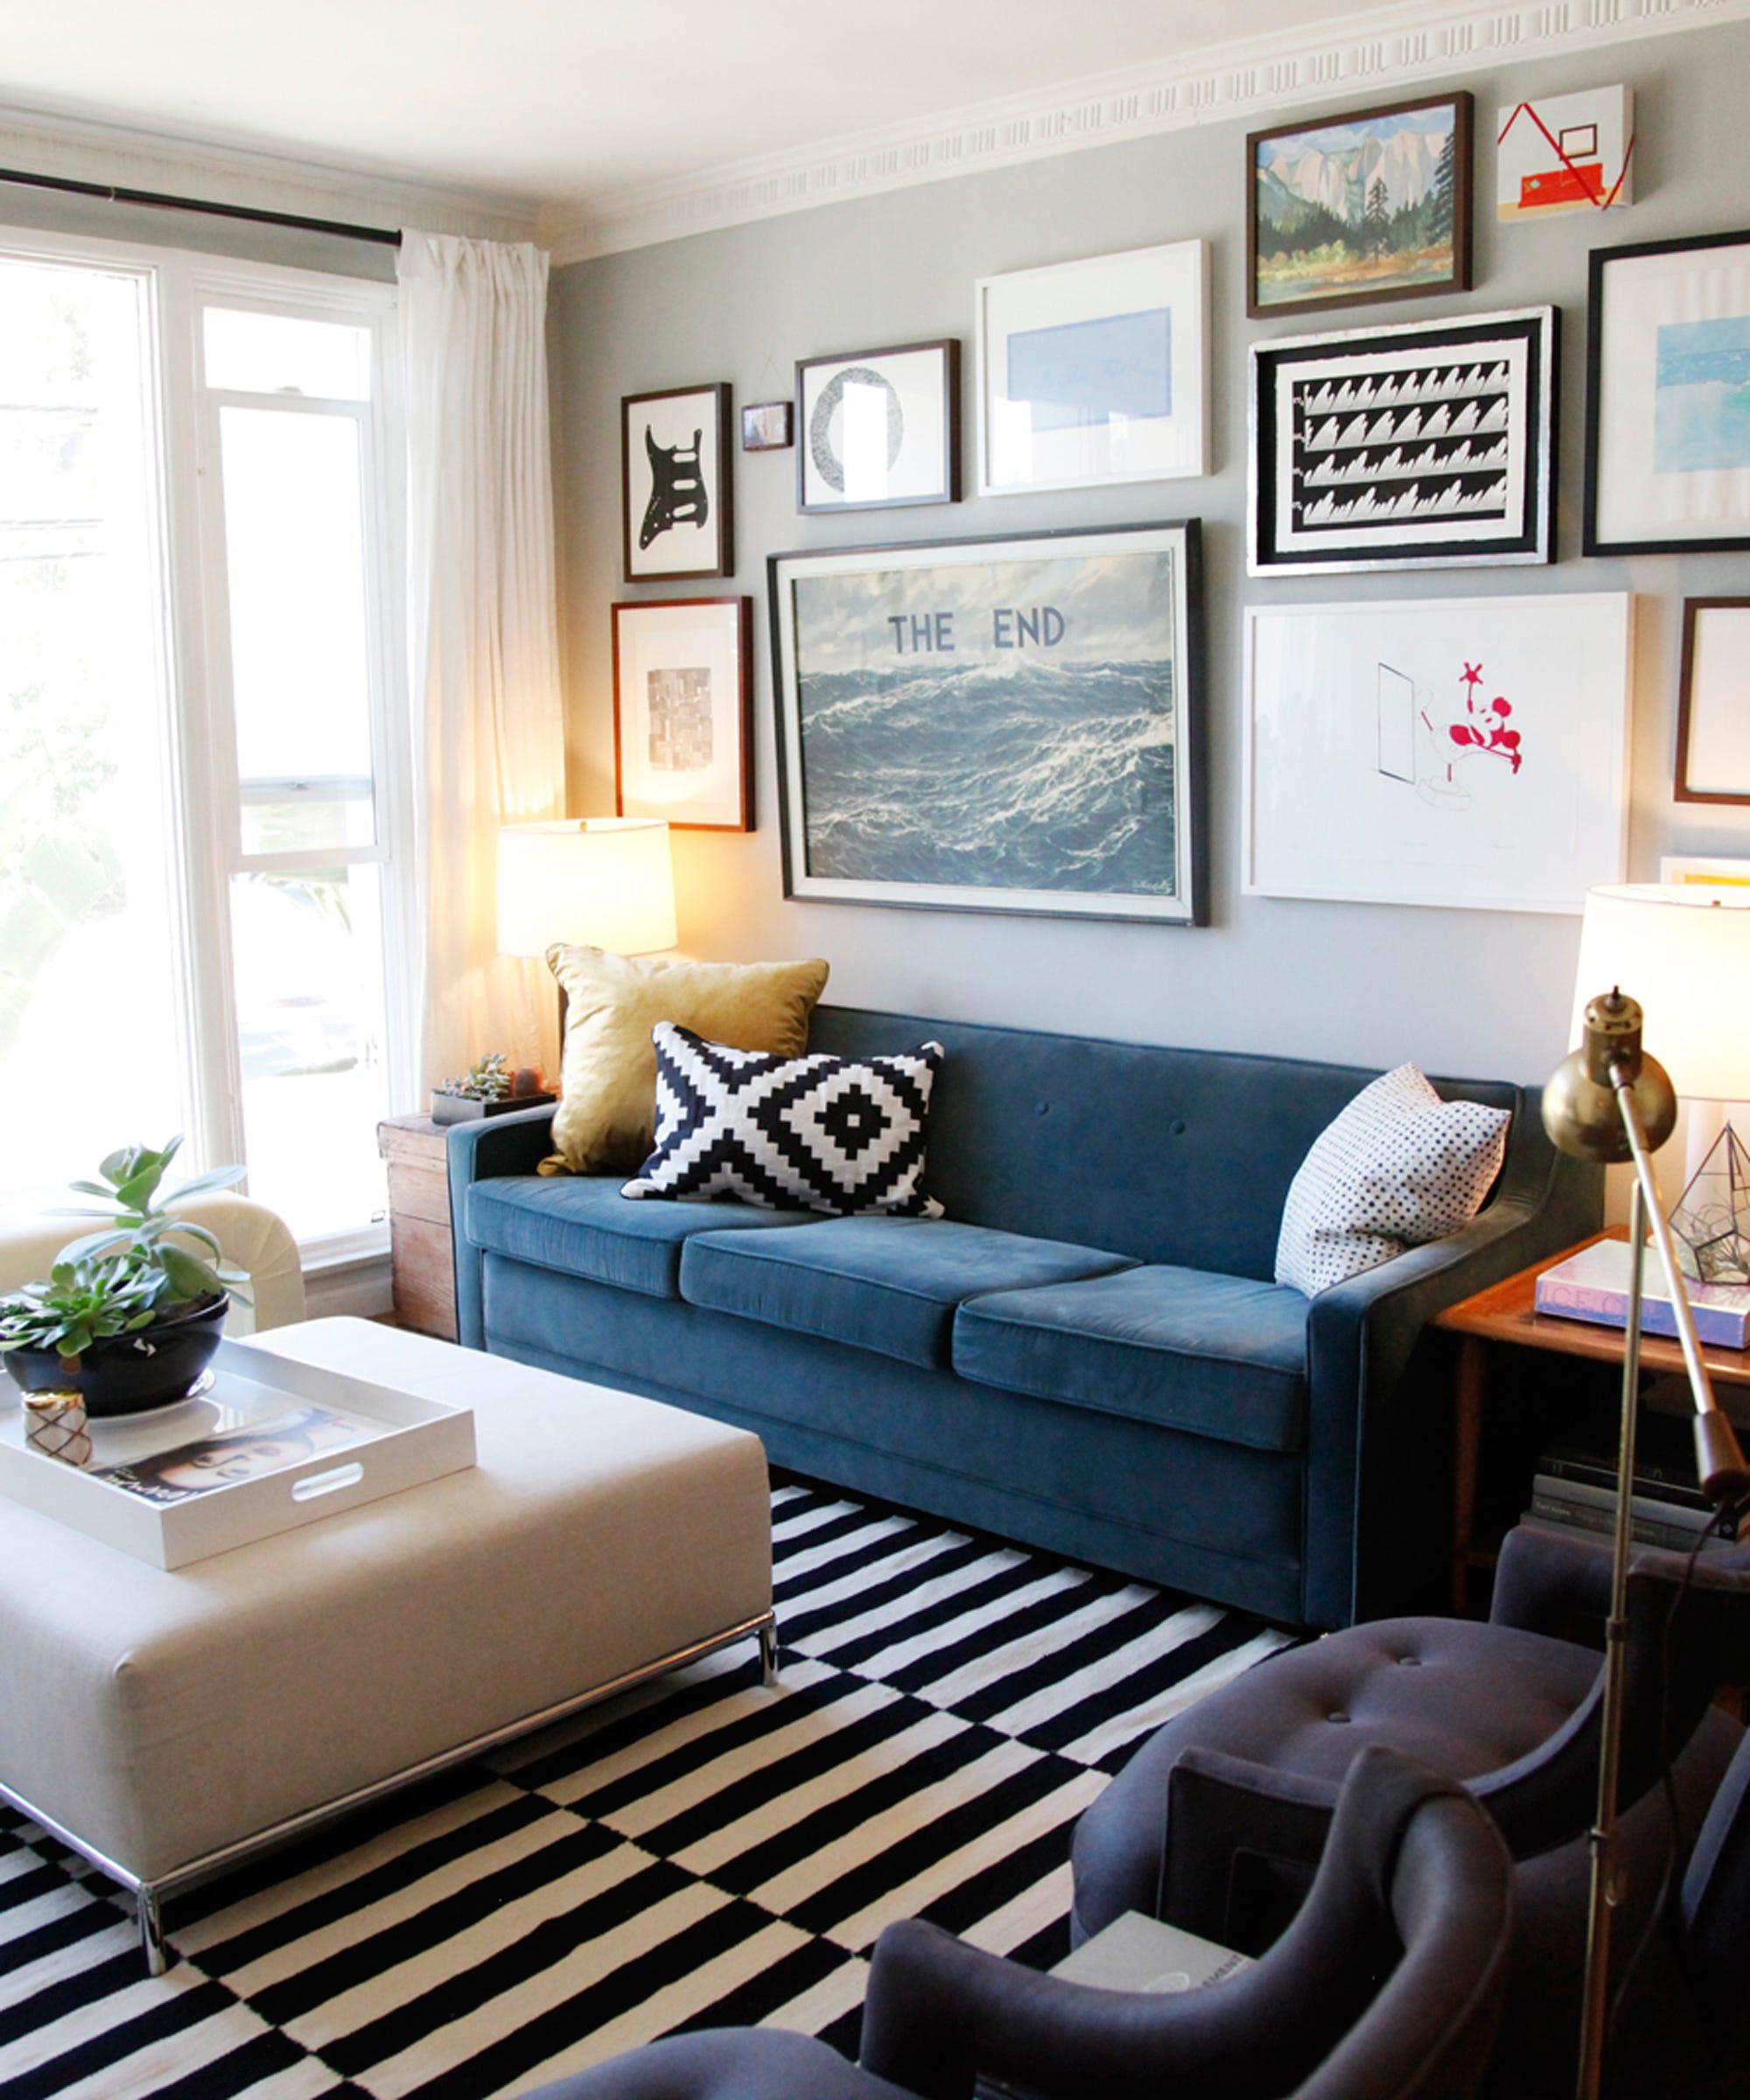 Cheap Home Decor Stores Best Sites Retailers - Home decor interior design